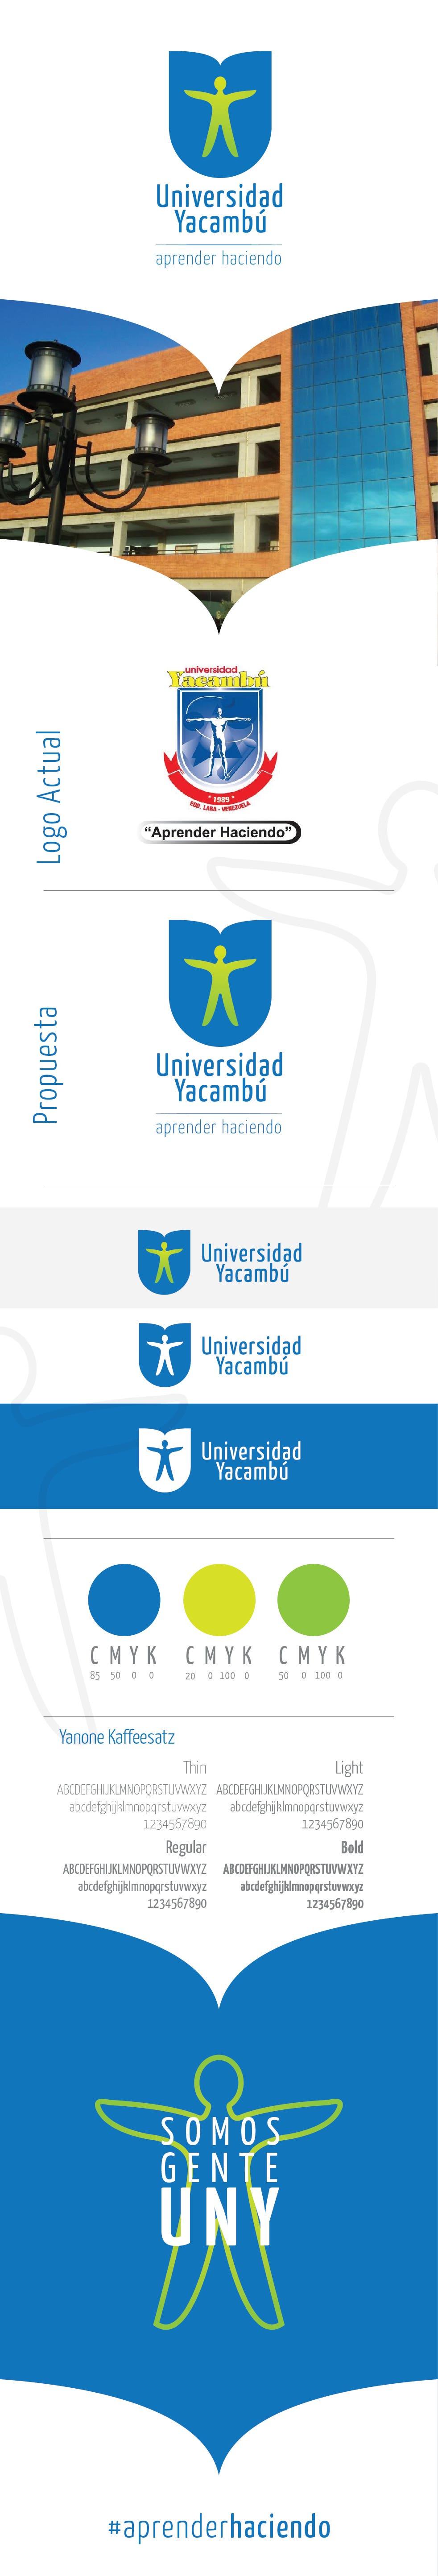 Universidad Yacambú / Rebranding